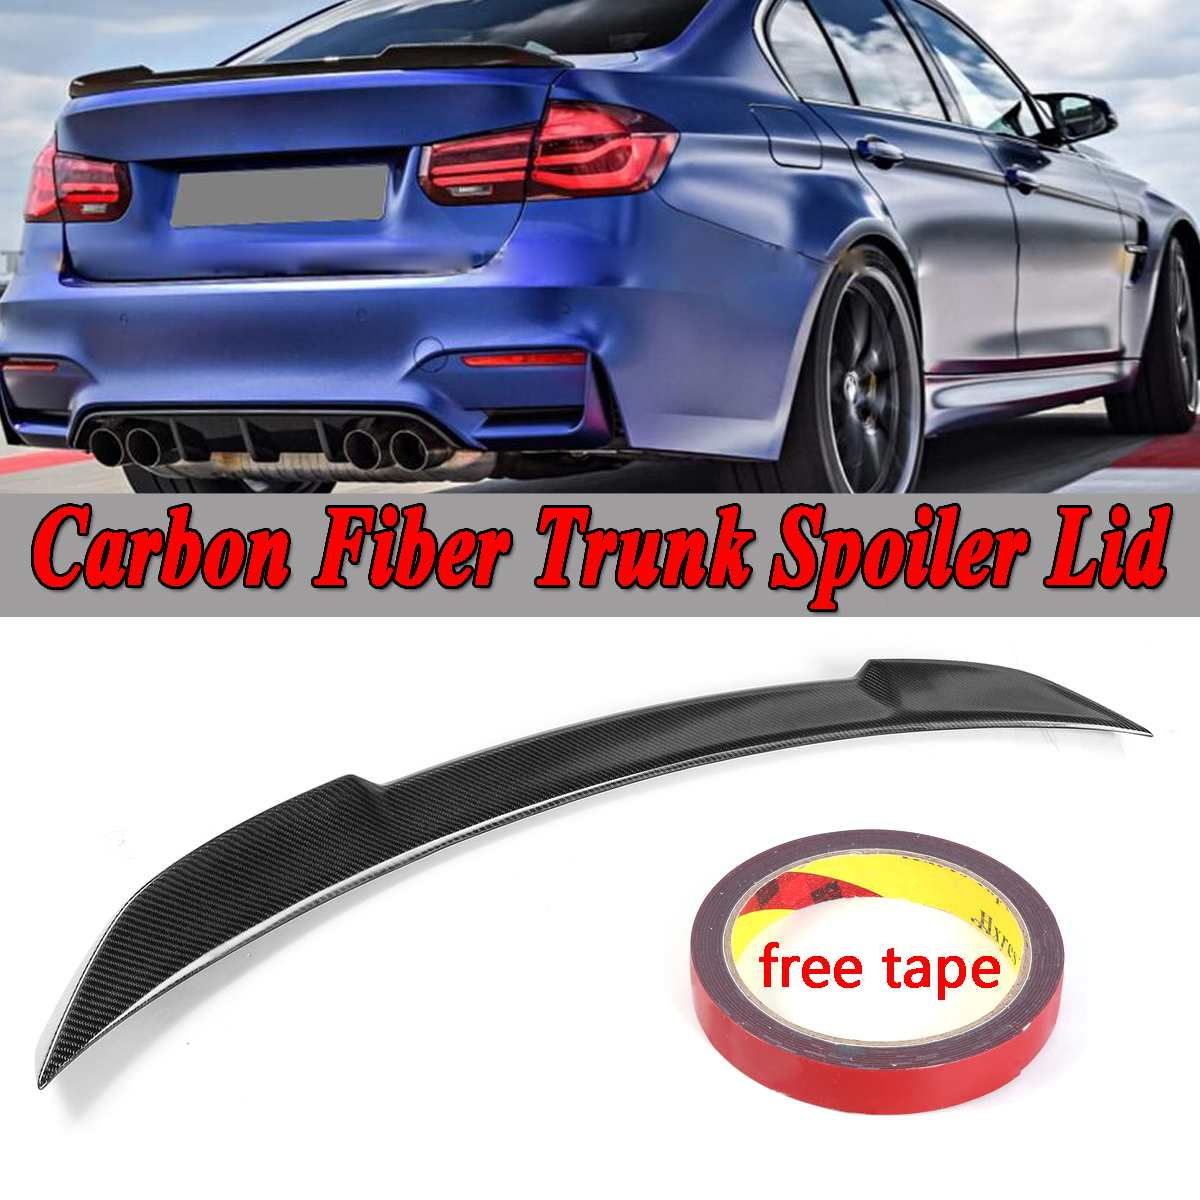 Performance Carbon Fiber Trunk Spoiler Lip Wing Fit 2012-2018 BMW F30 3-Series